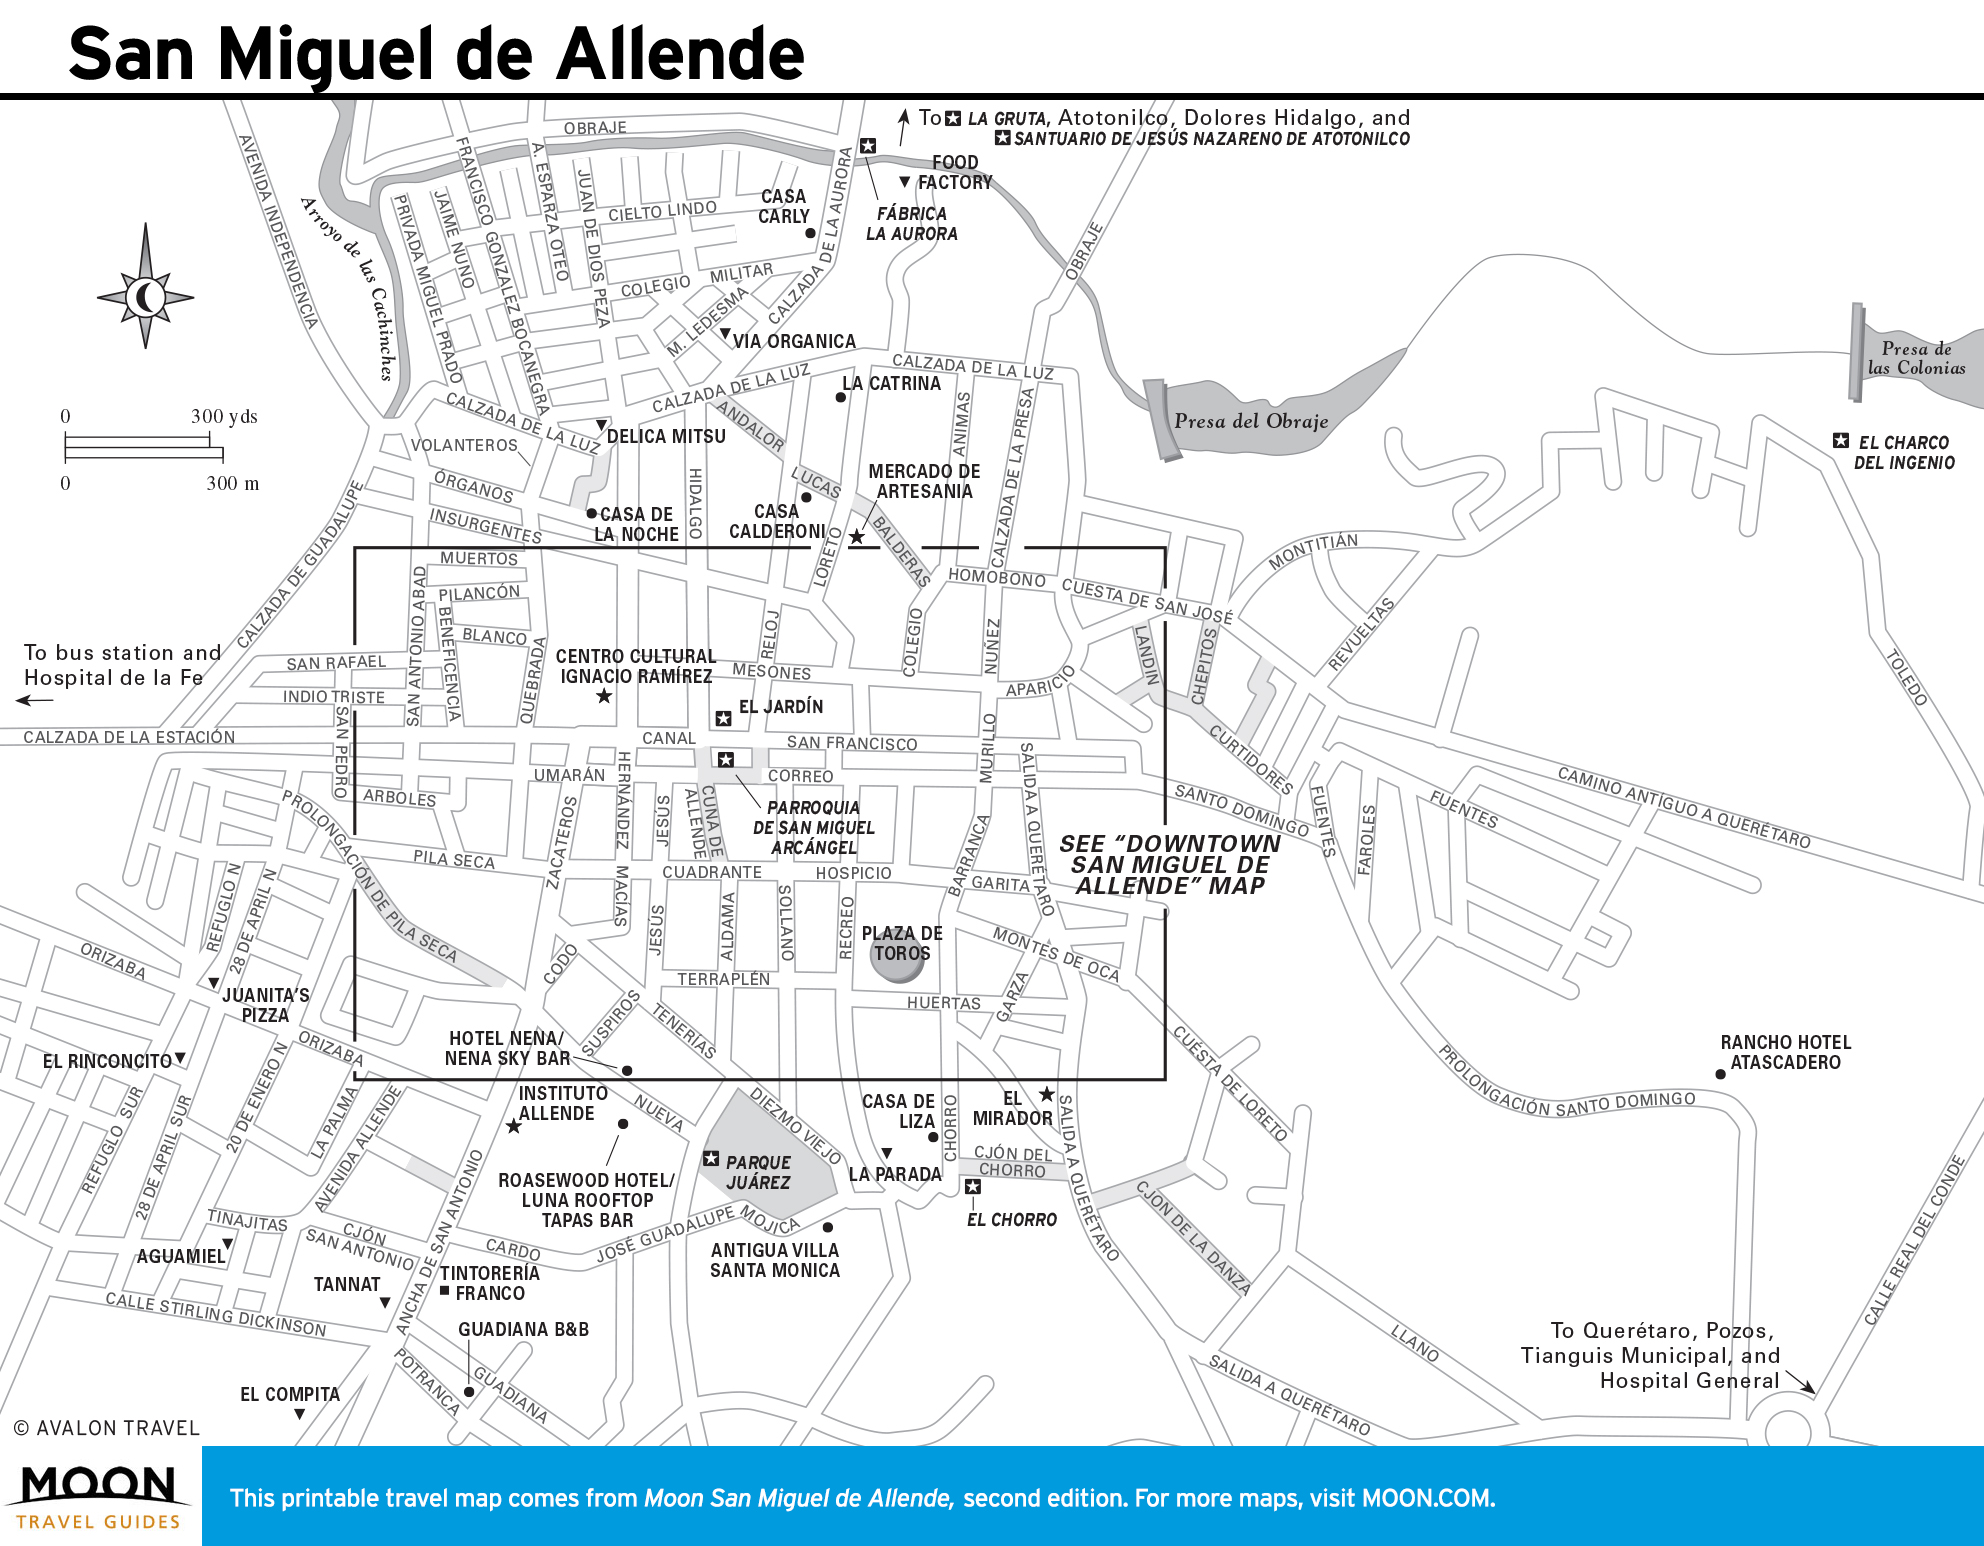 San Miguel de Allende | Moon Travel Guides on rio de janeiro map, rincon de guayabitos map, ixtapan de la sal map, queretaro map, real de catorce map, puerto vallarta map, ixtapa zihuatanejo map, hermosillo map, segovia spain on a map, mexico map, puebla on map, latin america map, chichen itza map, morelia map, cozumel map, san miguel county nm map, antigua guatemala map, buenos aires map, isla mujeres map, san cristobal de las casas map,